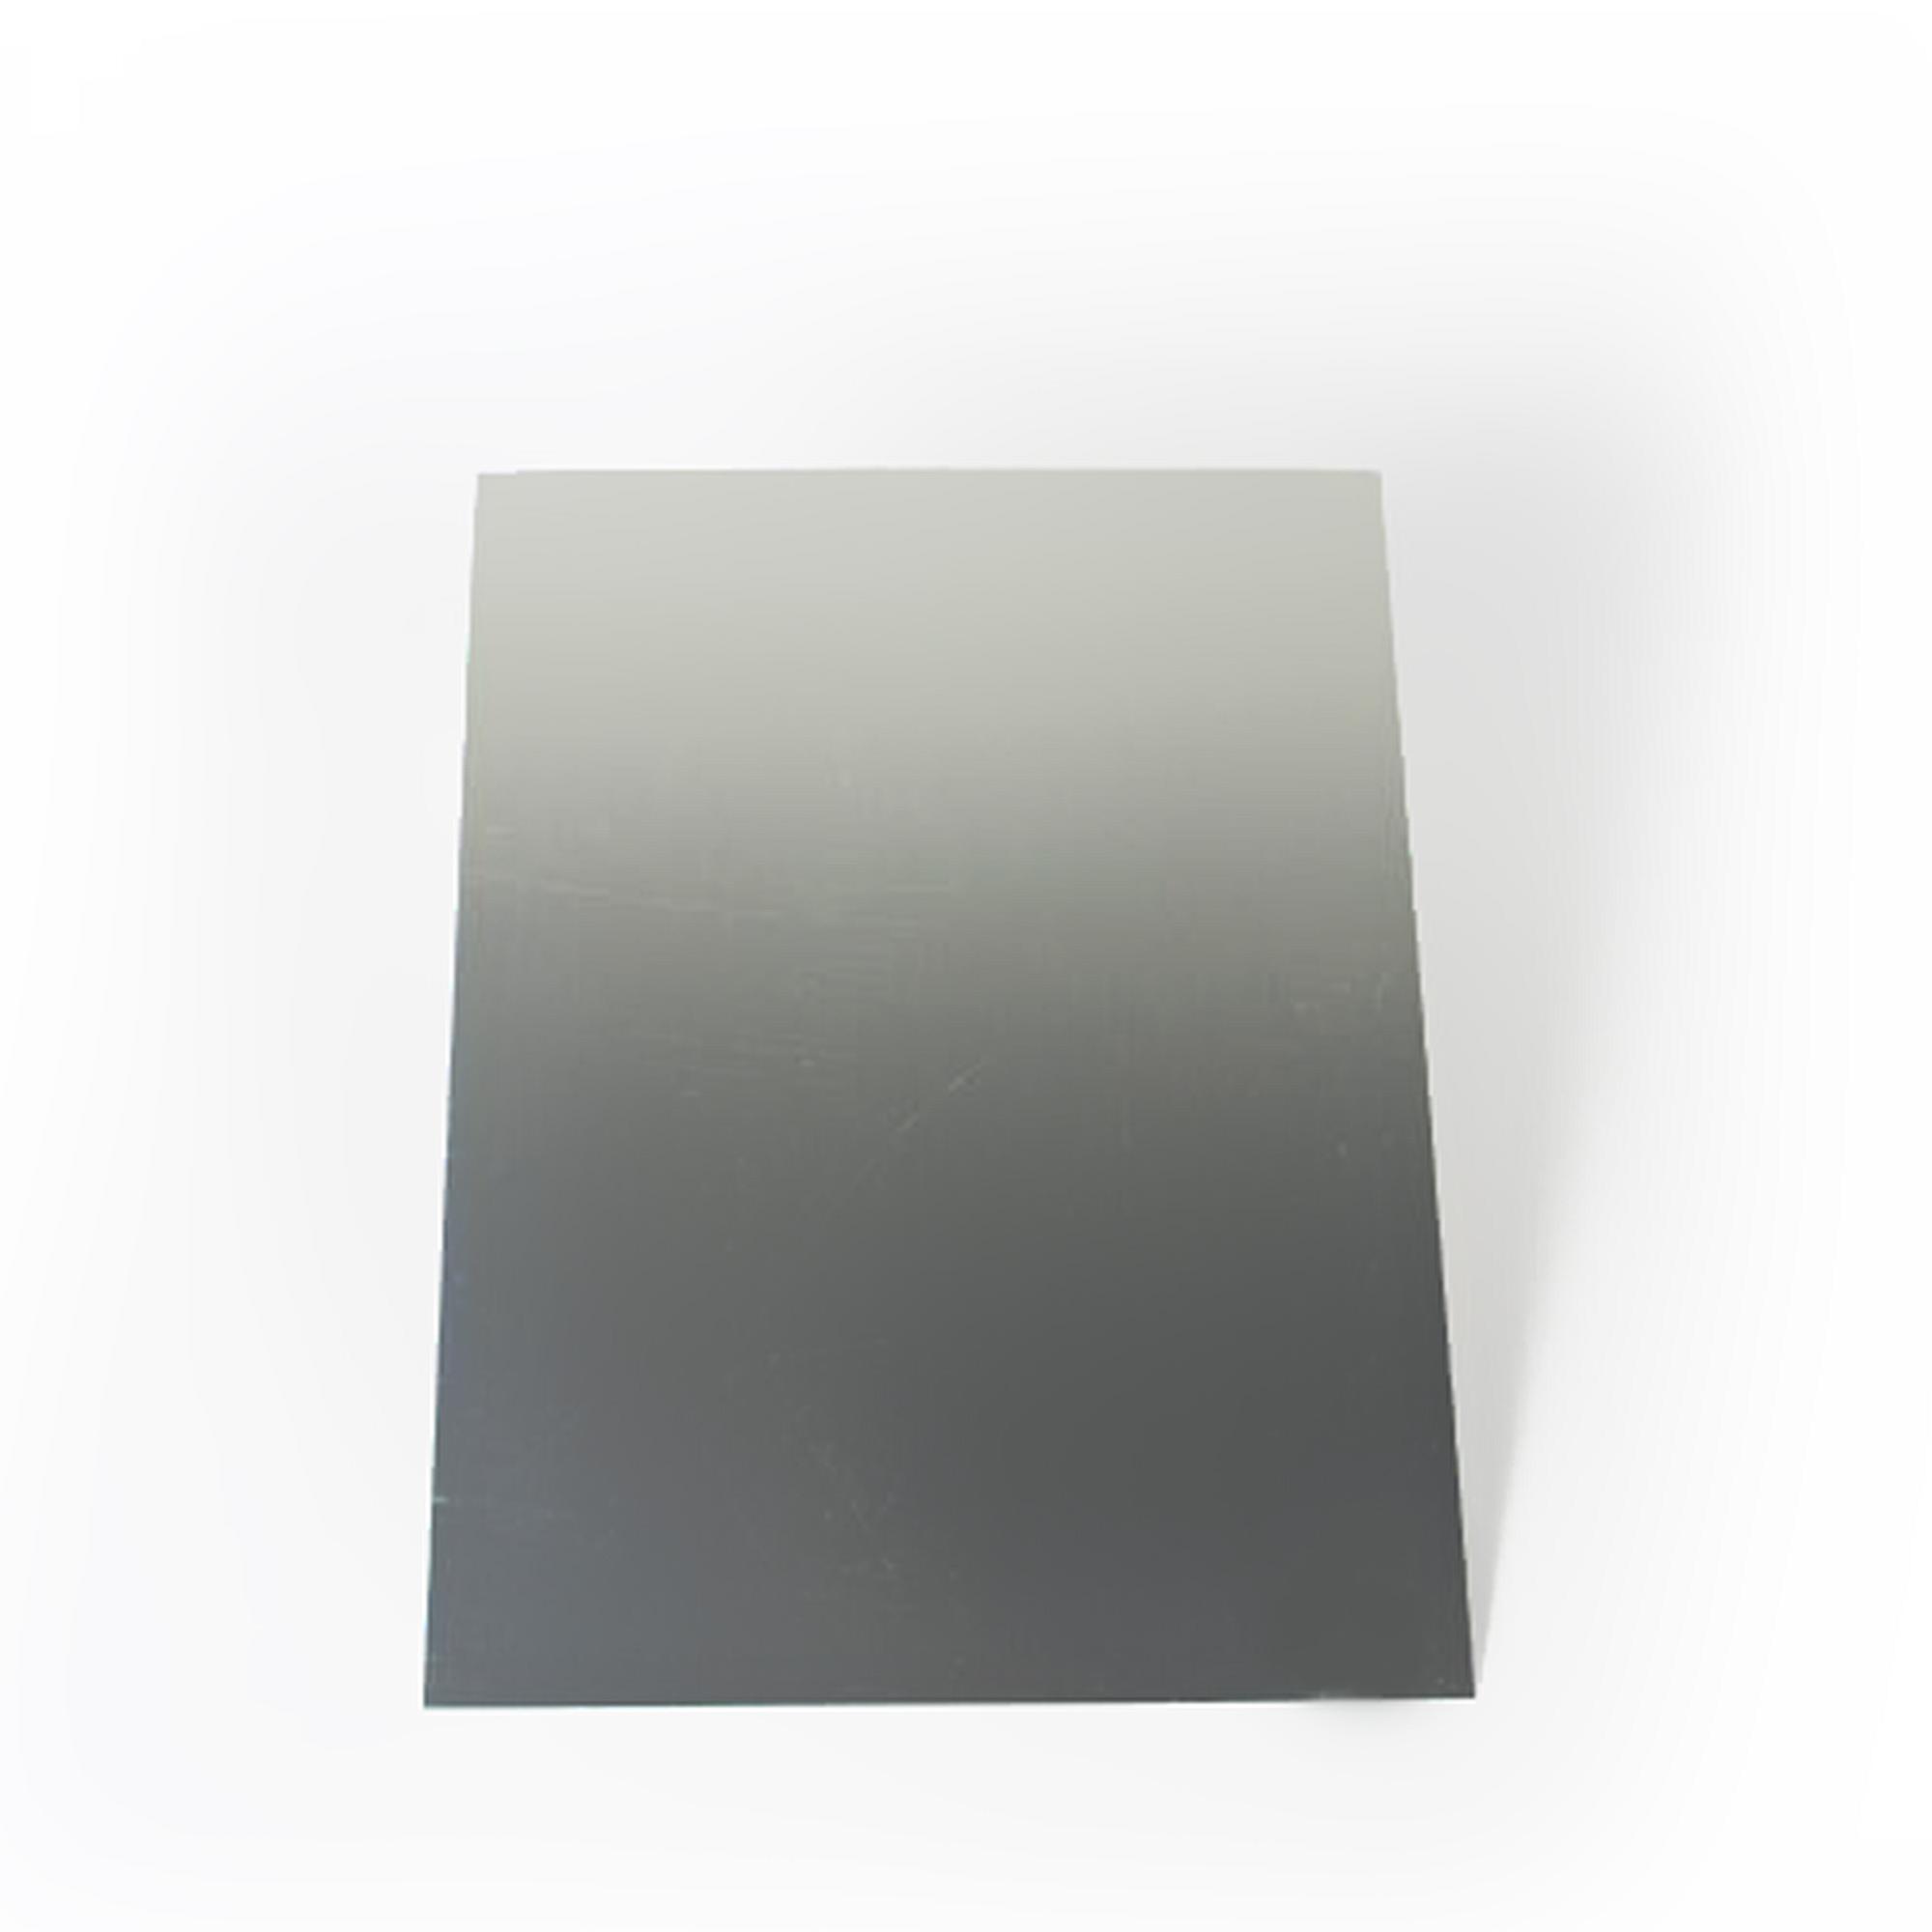 Металлическая матовая пластина формата А4